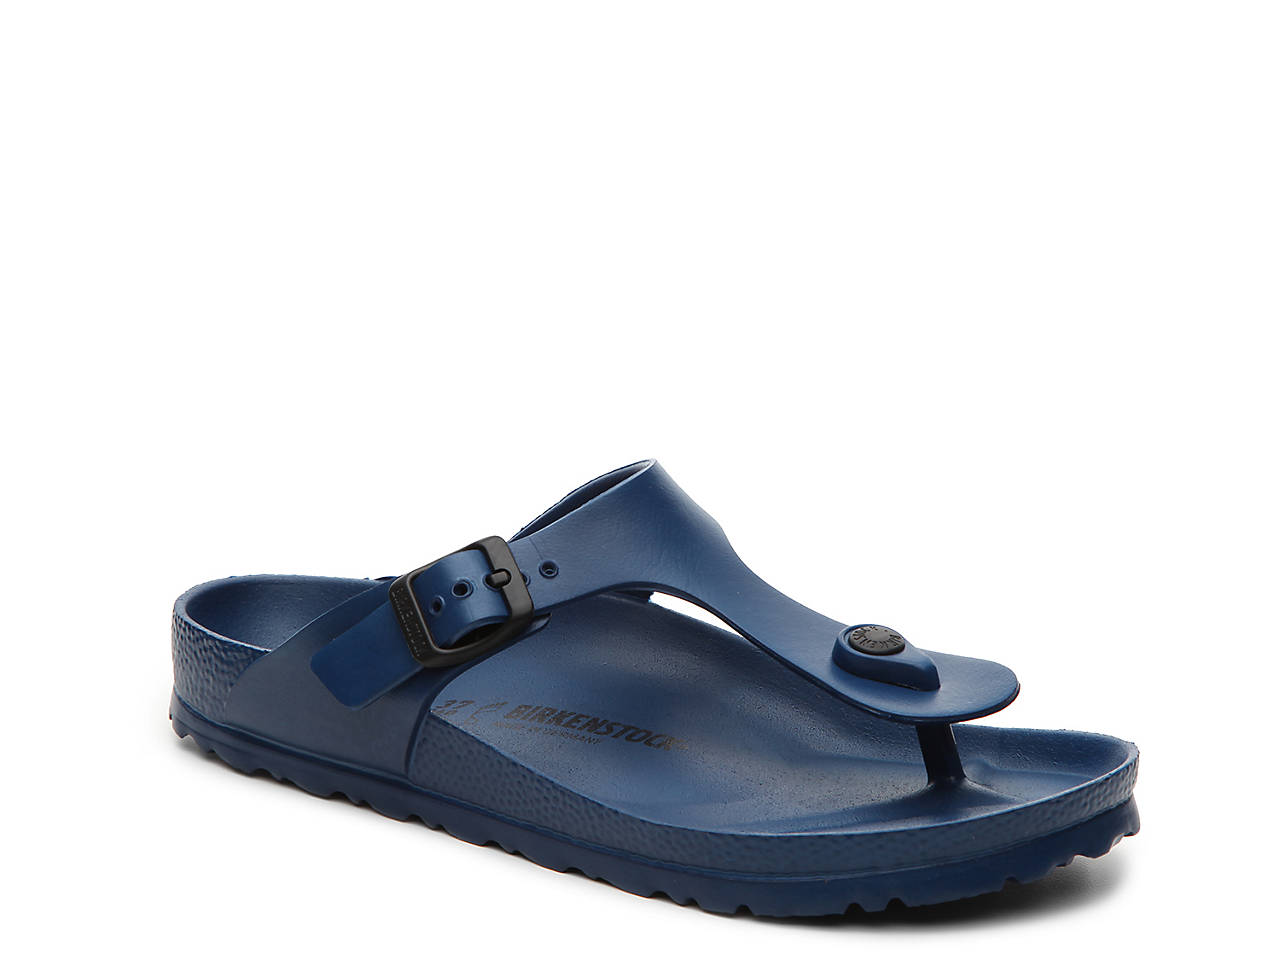 Womens sandals canada online - Essentials Gizeh Eva Flat Sandal Womens